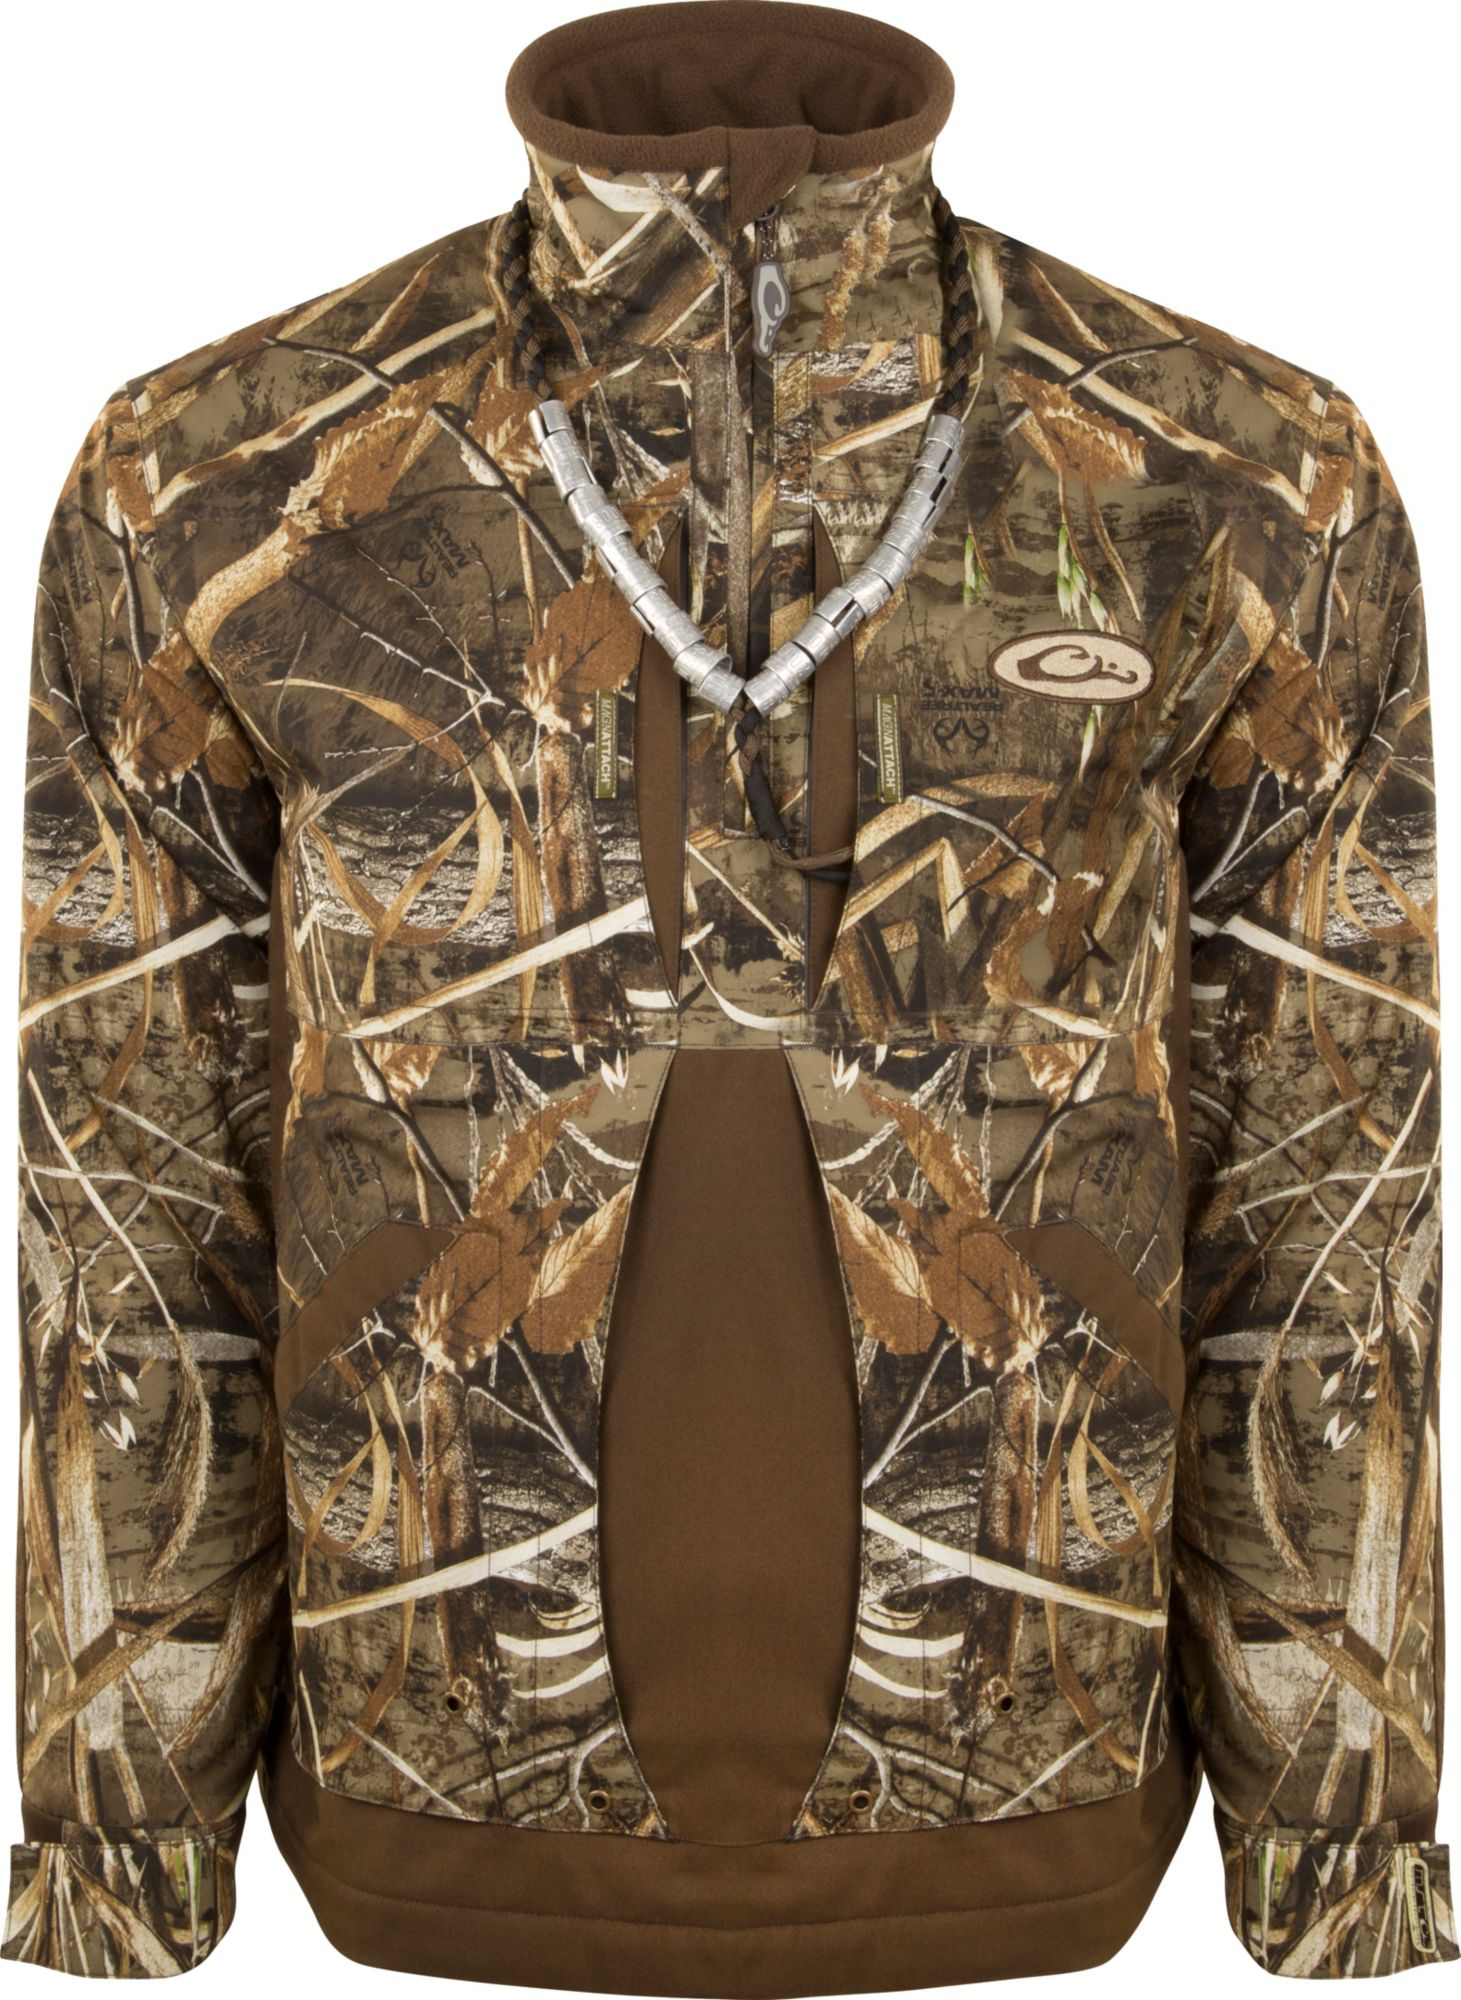 Drake Waterfowl Guardian Flex 1/4 Zip Hunting Jacket, Men's, Size: XXL, Multi thumbnail